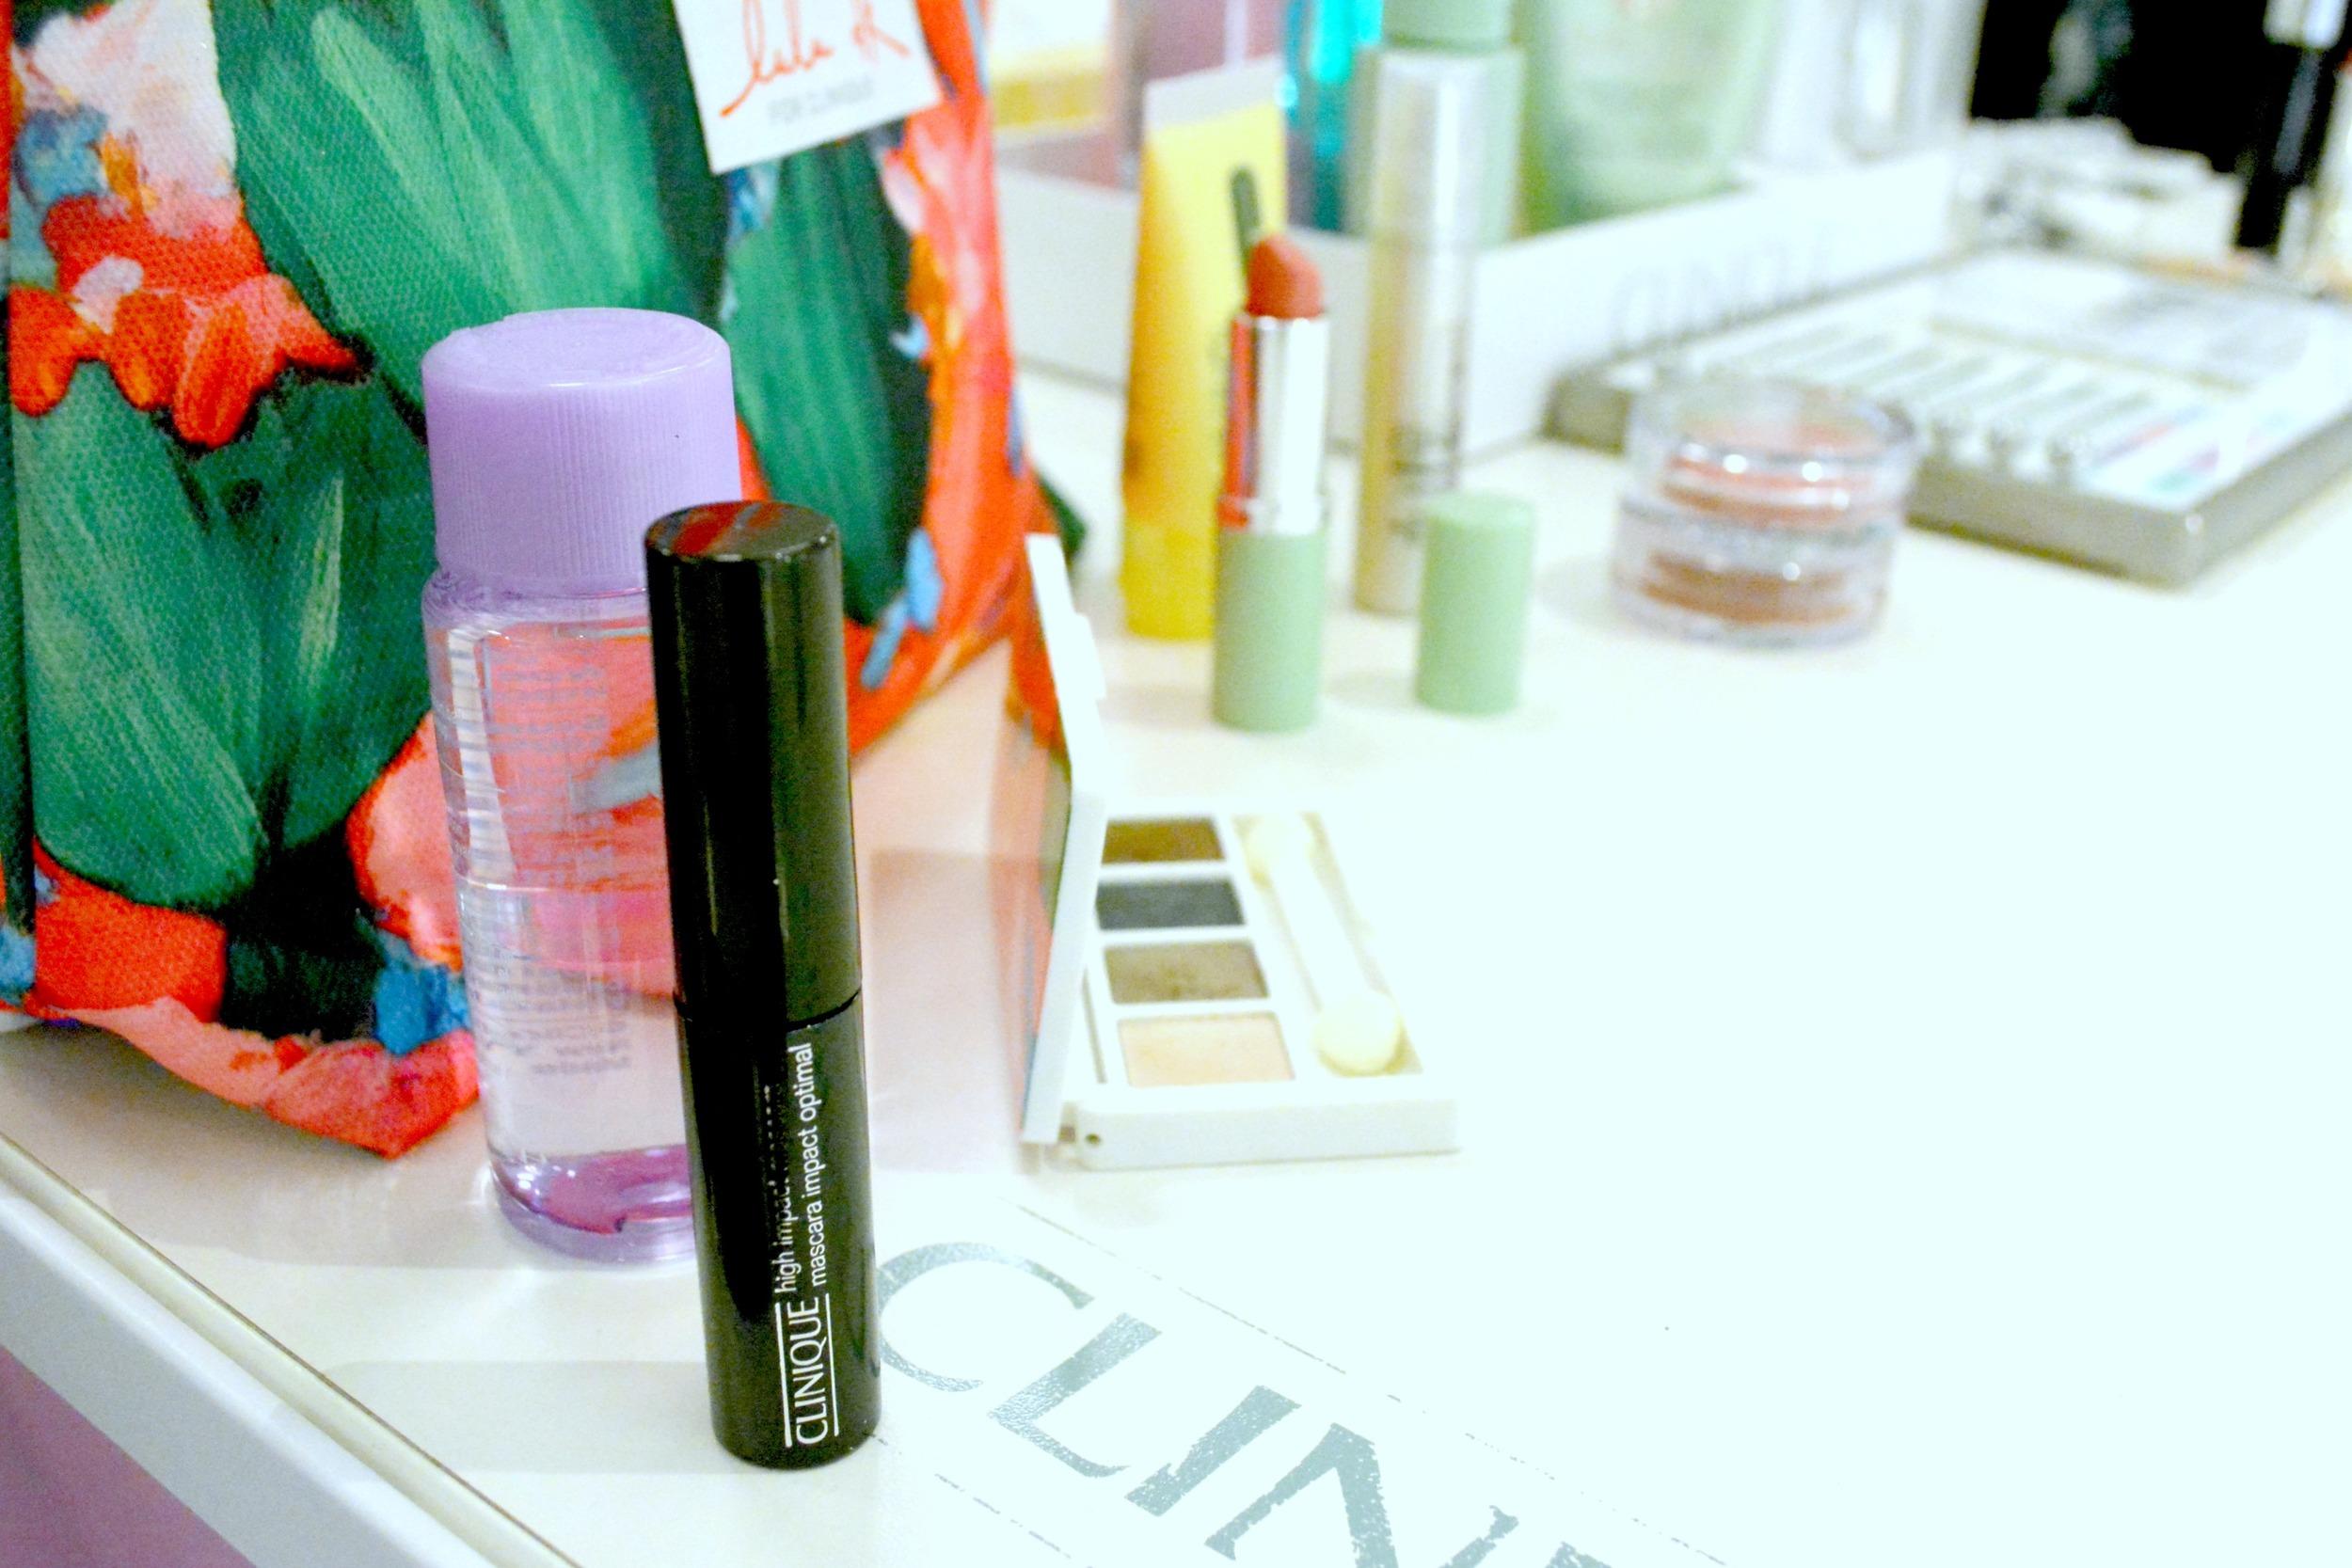 Clinique makeup at Macy's